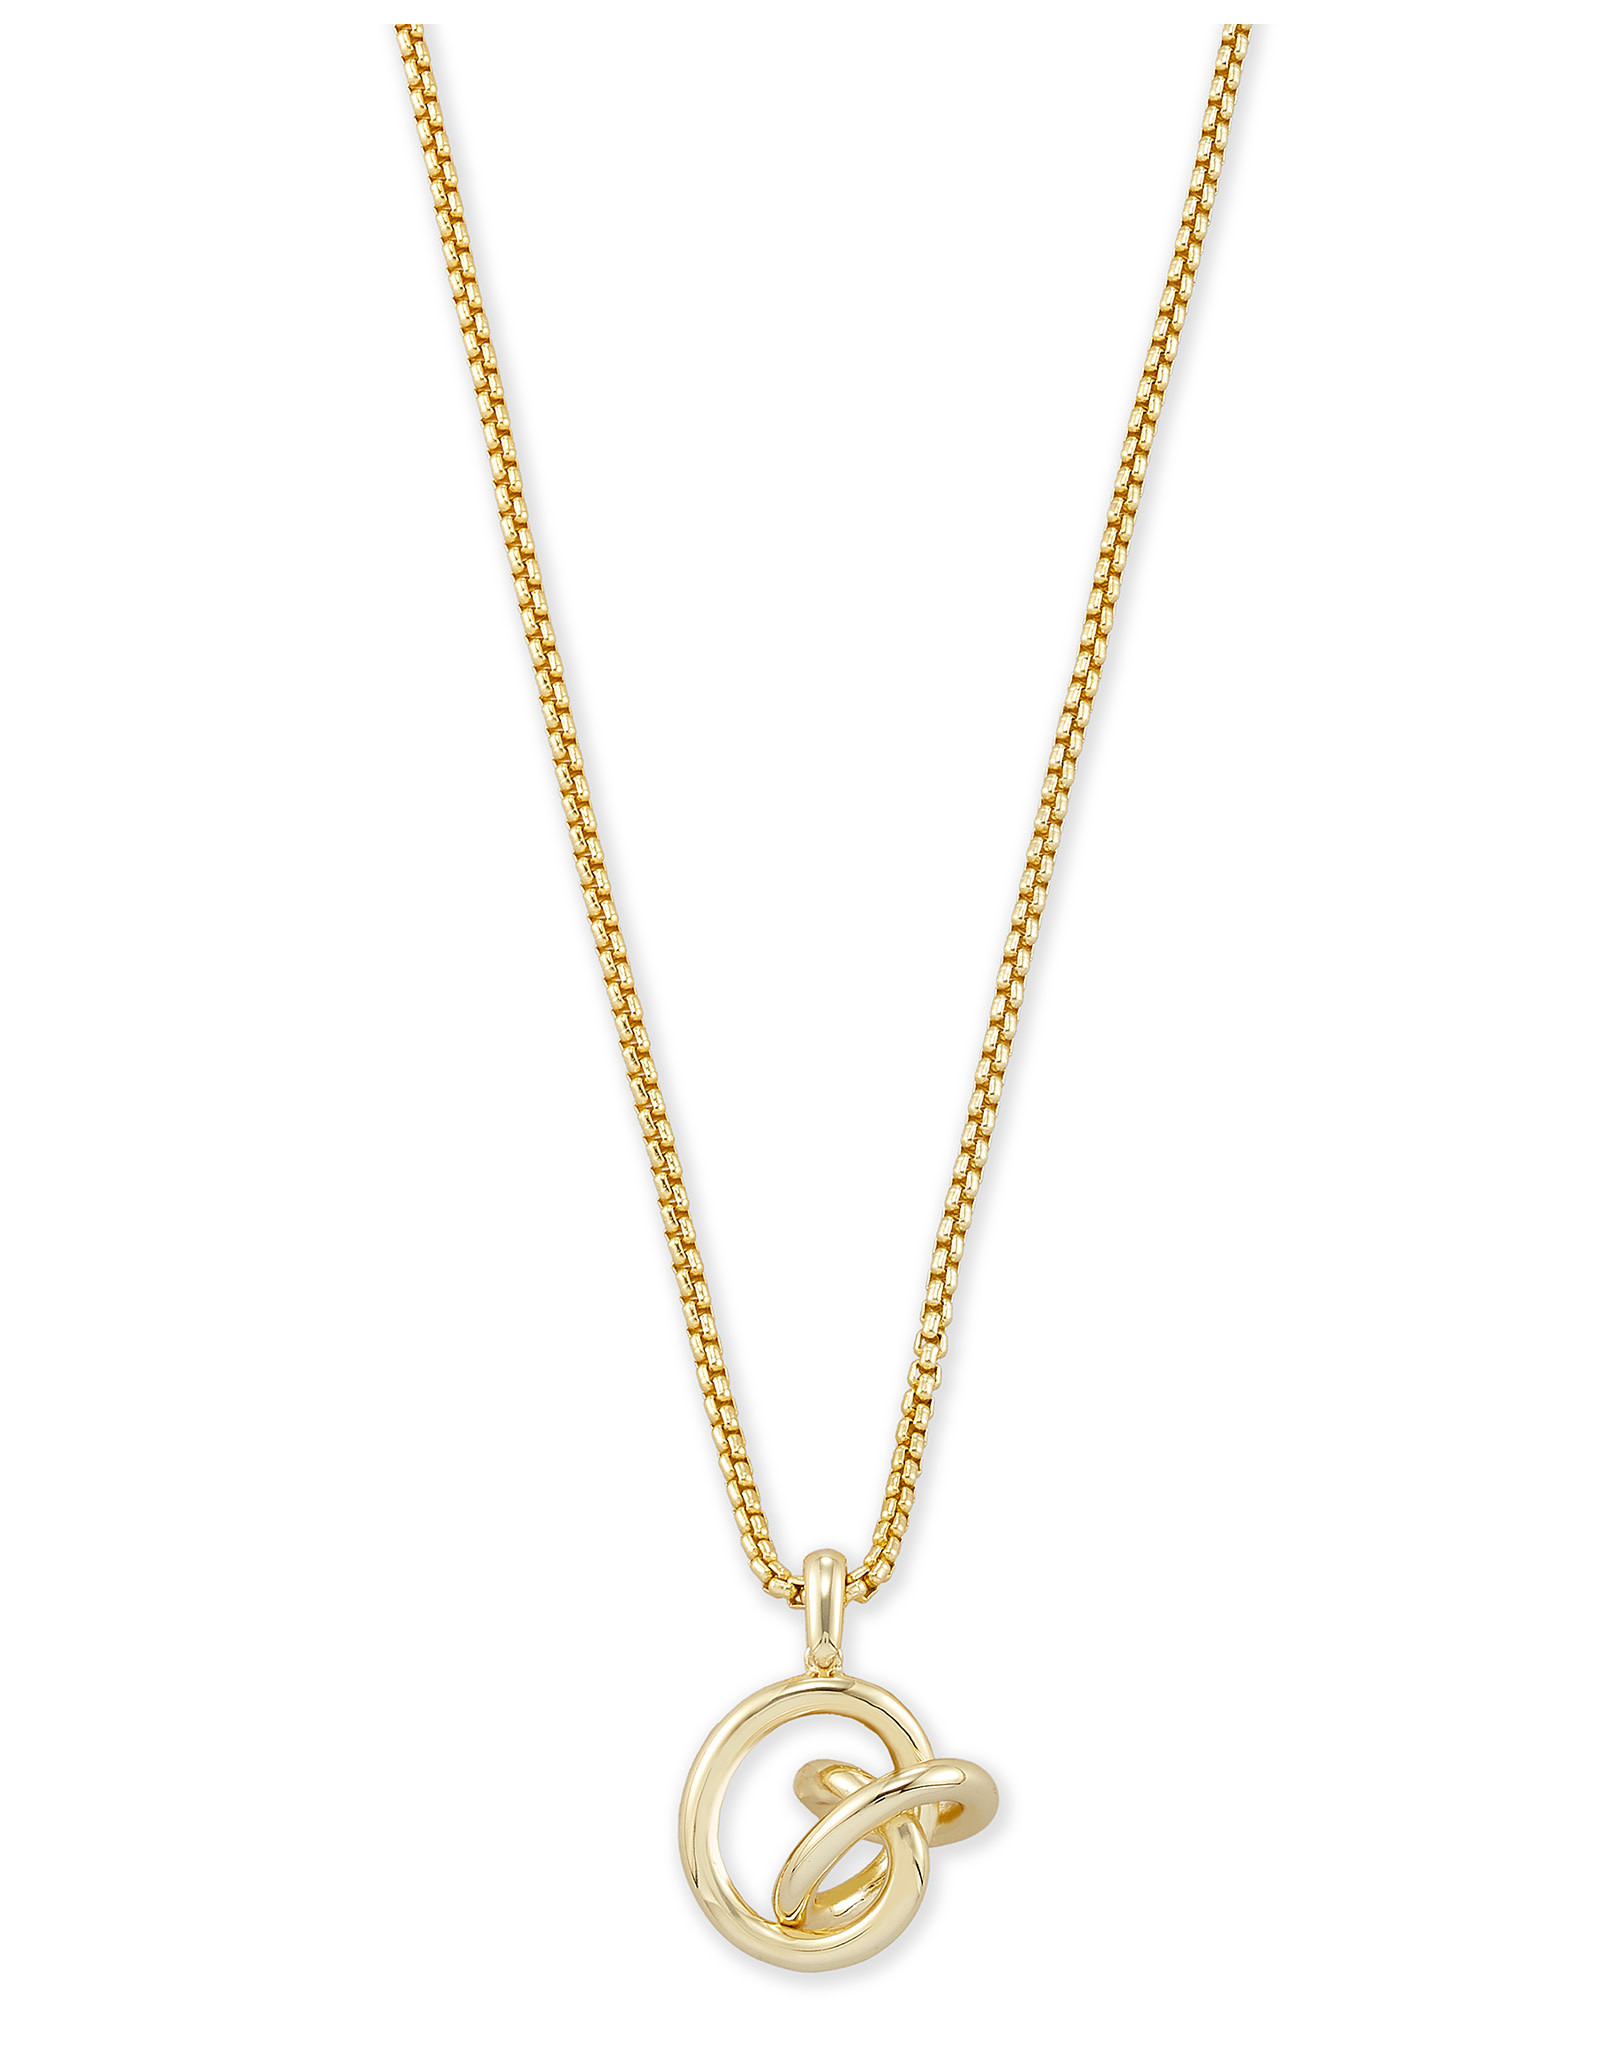 Kendra Scott Presleigh SM Long Pendant in Gold